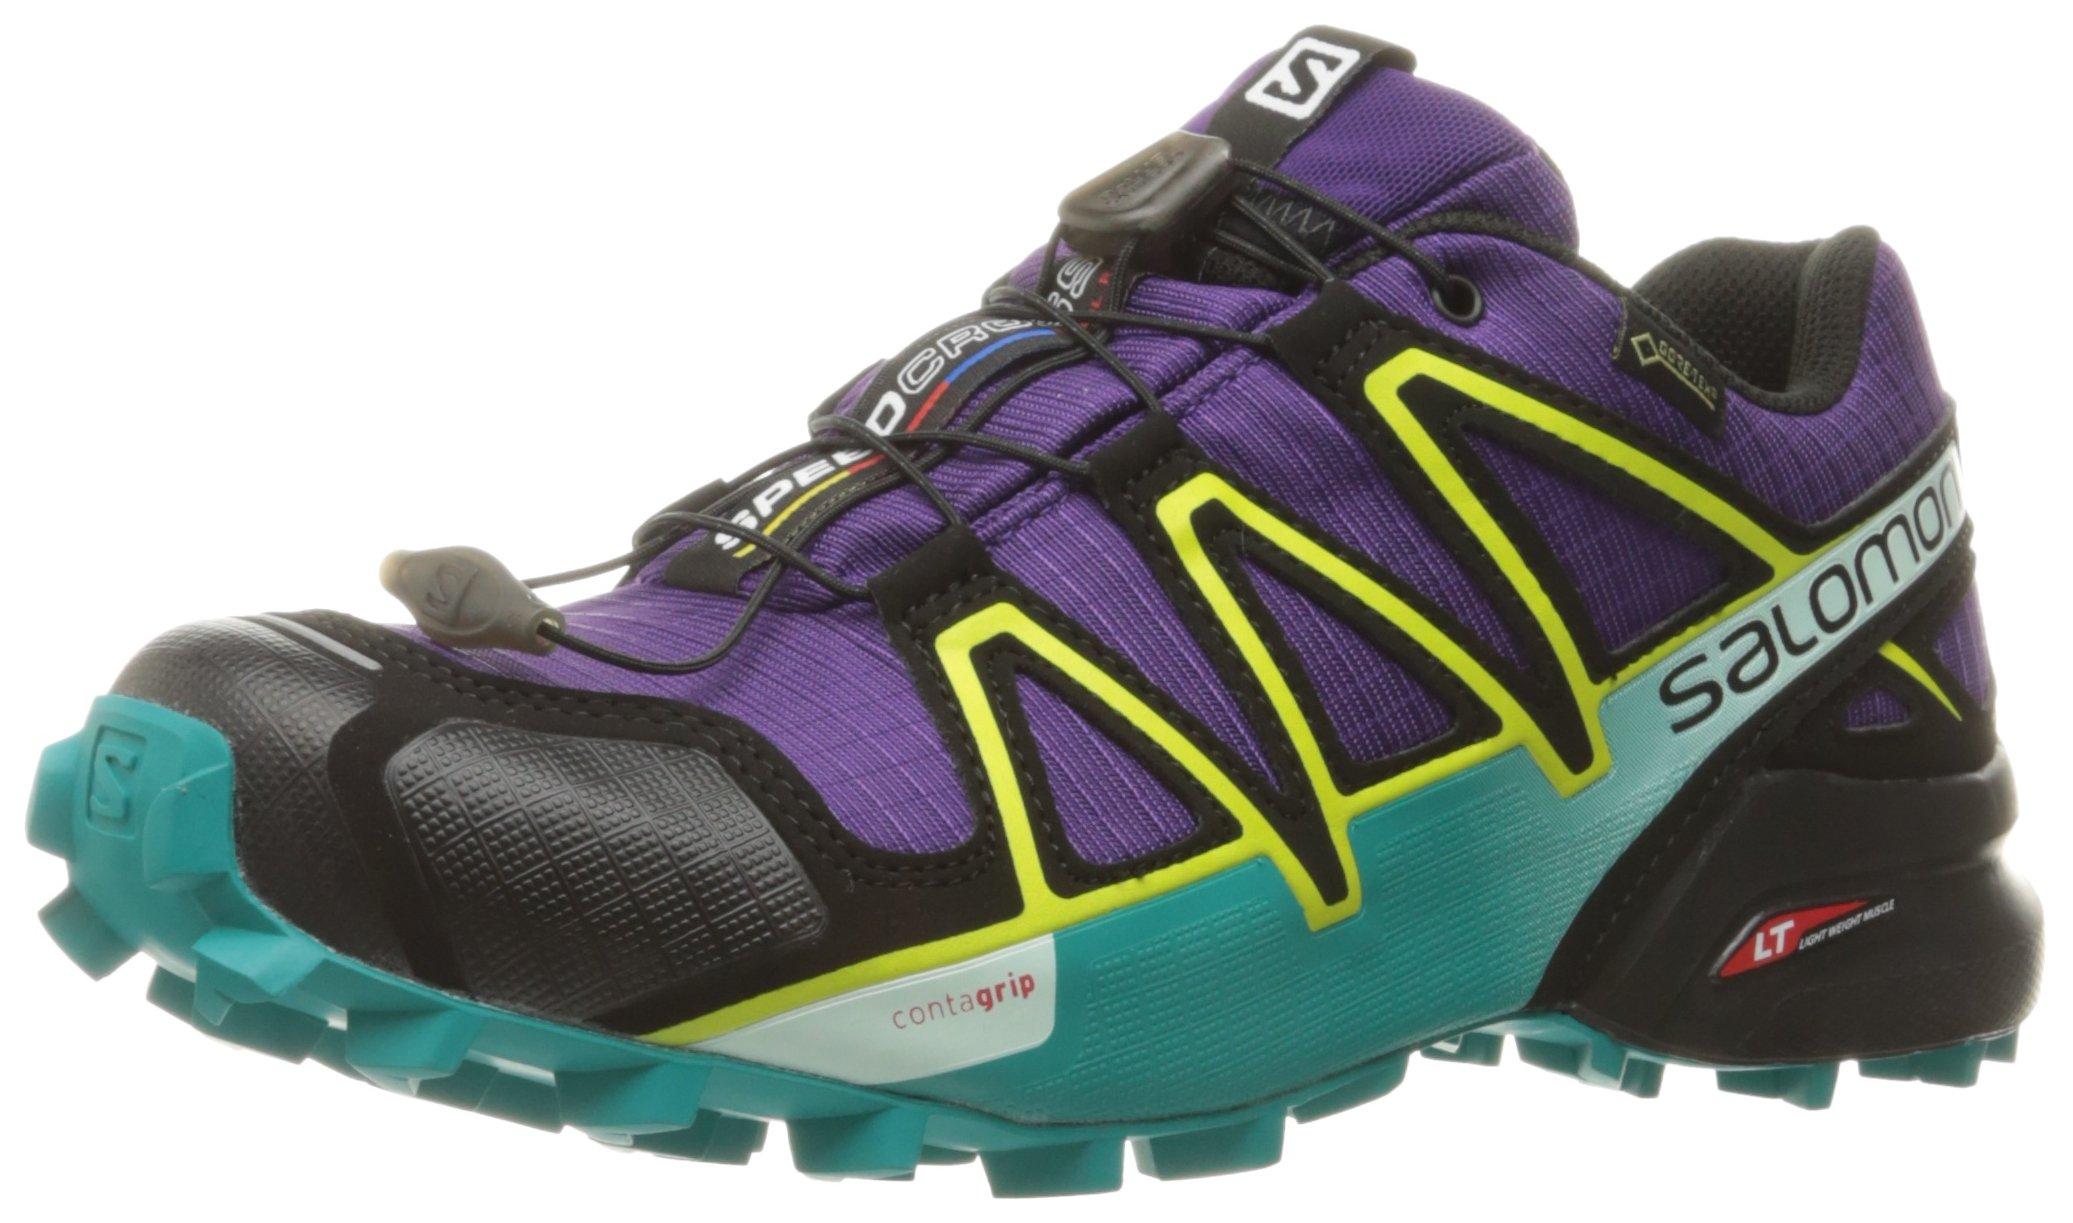 Salomon Men's XA Pro 3D Trail Running Shoes, Acai/Deep Peacock Blue/Sulphur Spring, 10 M US